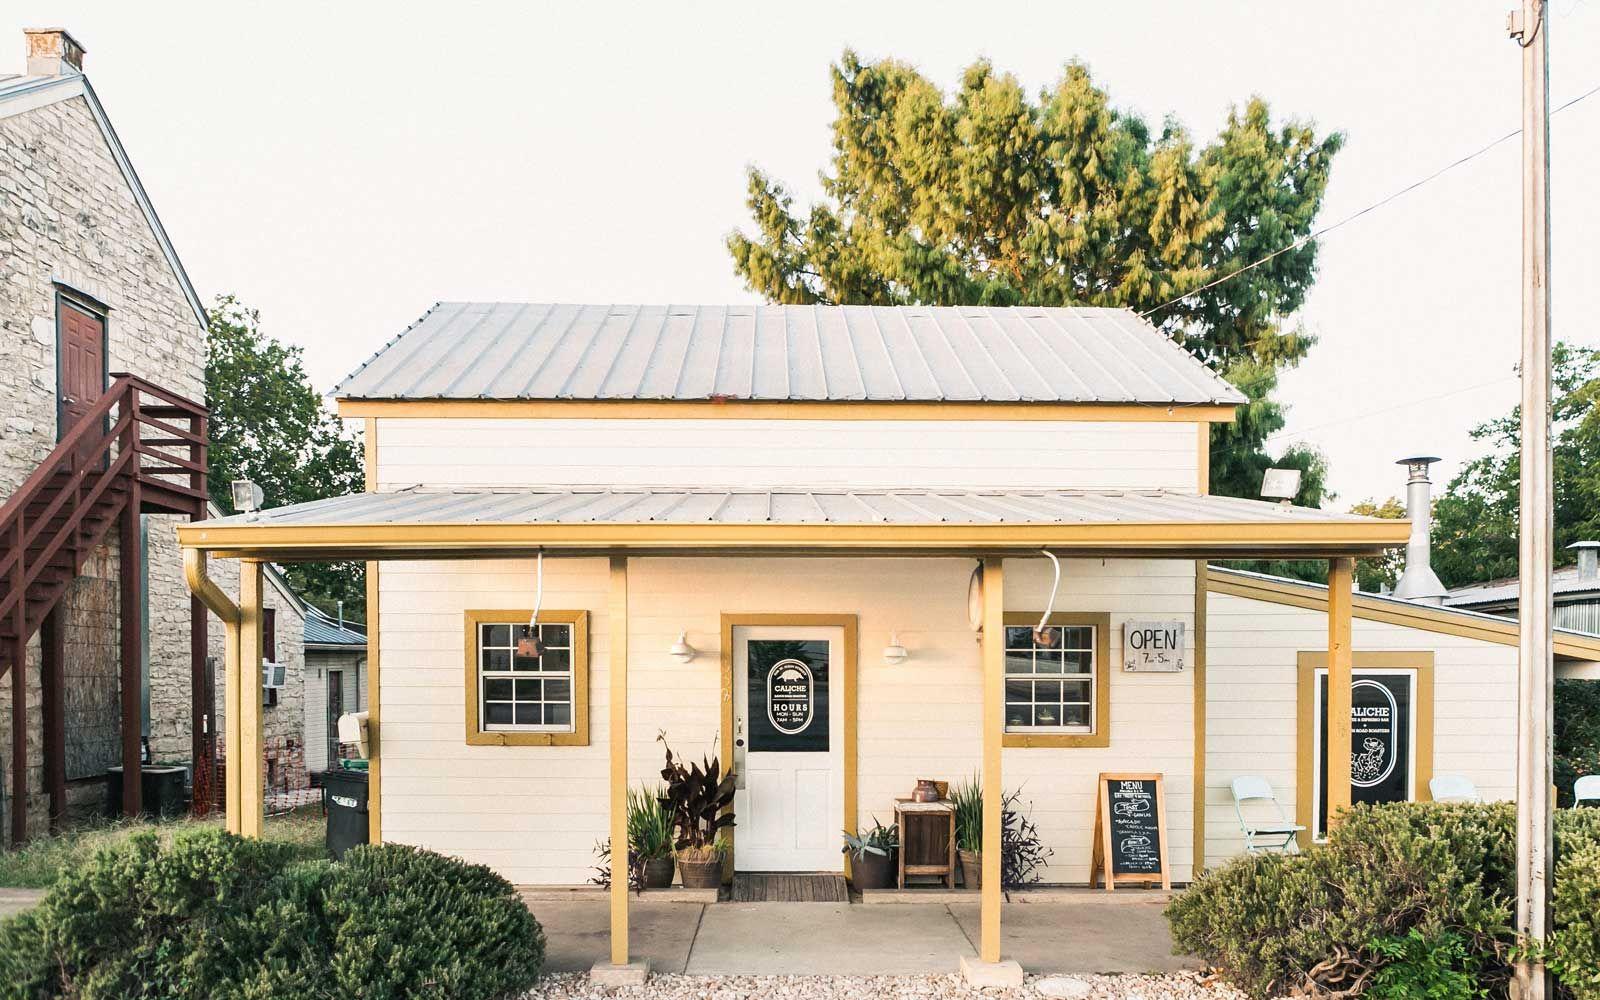 Espresso in Fredericksburg, Texas